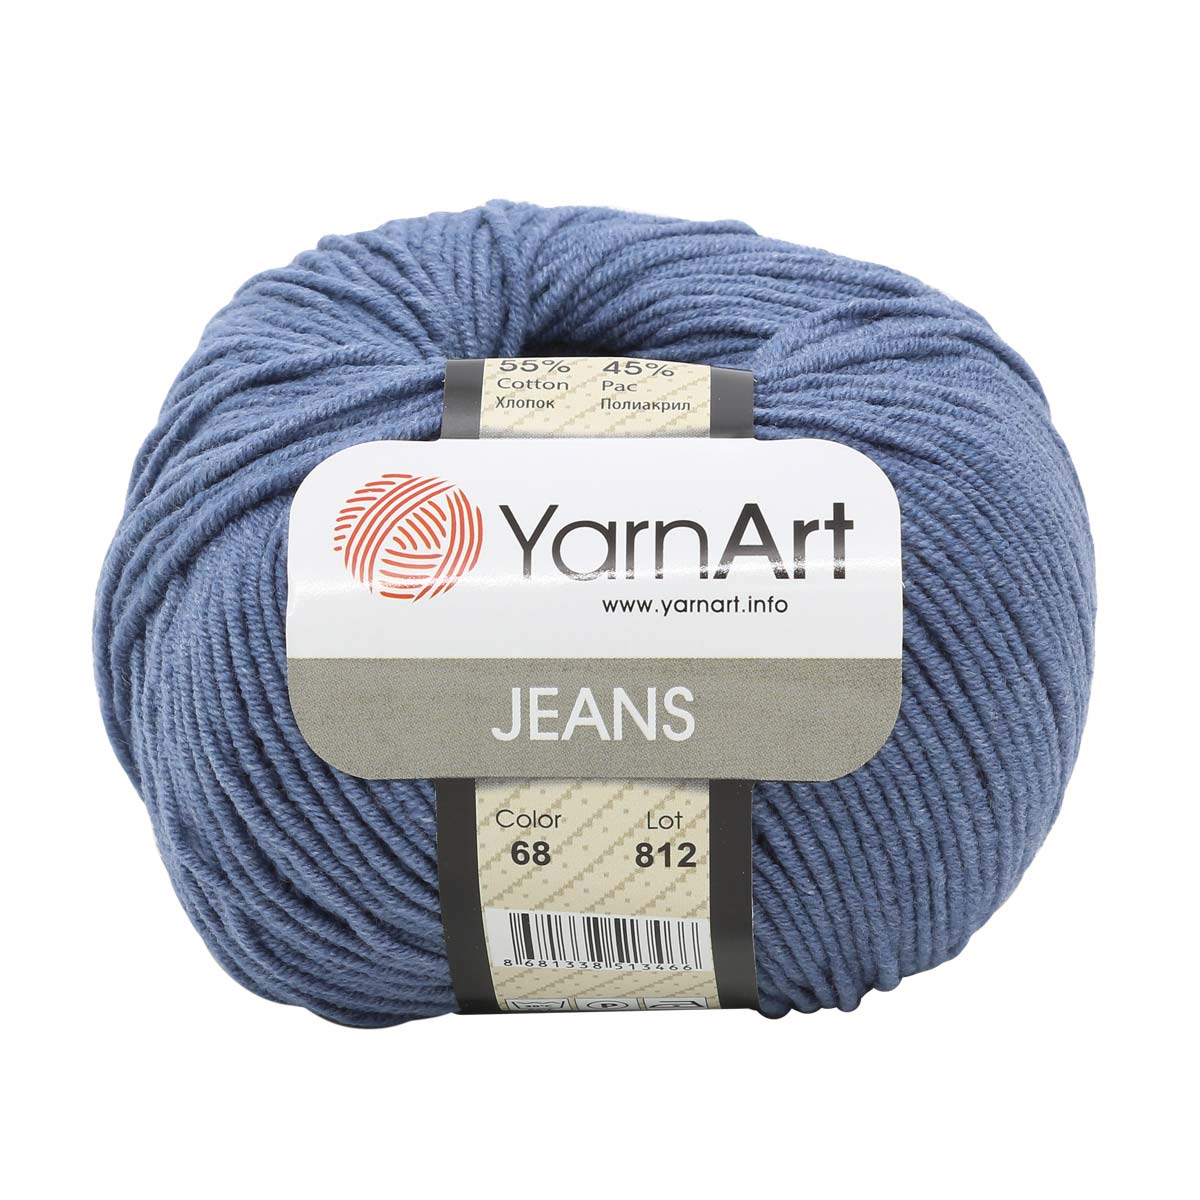 Пряжа YarnArt 'Jeans' 50гр. 160м. (55%хлопок, 45%ПАК) ТУ